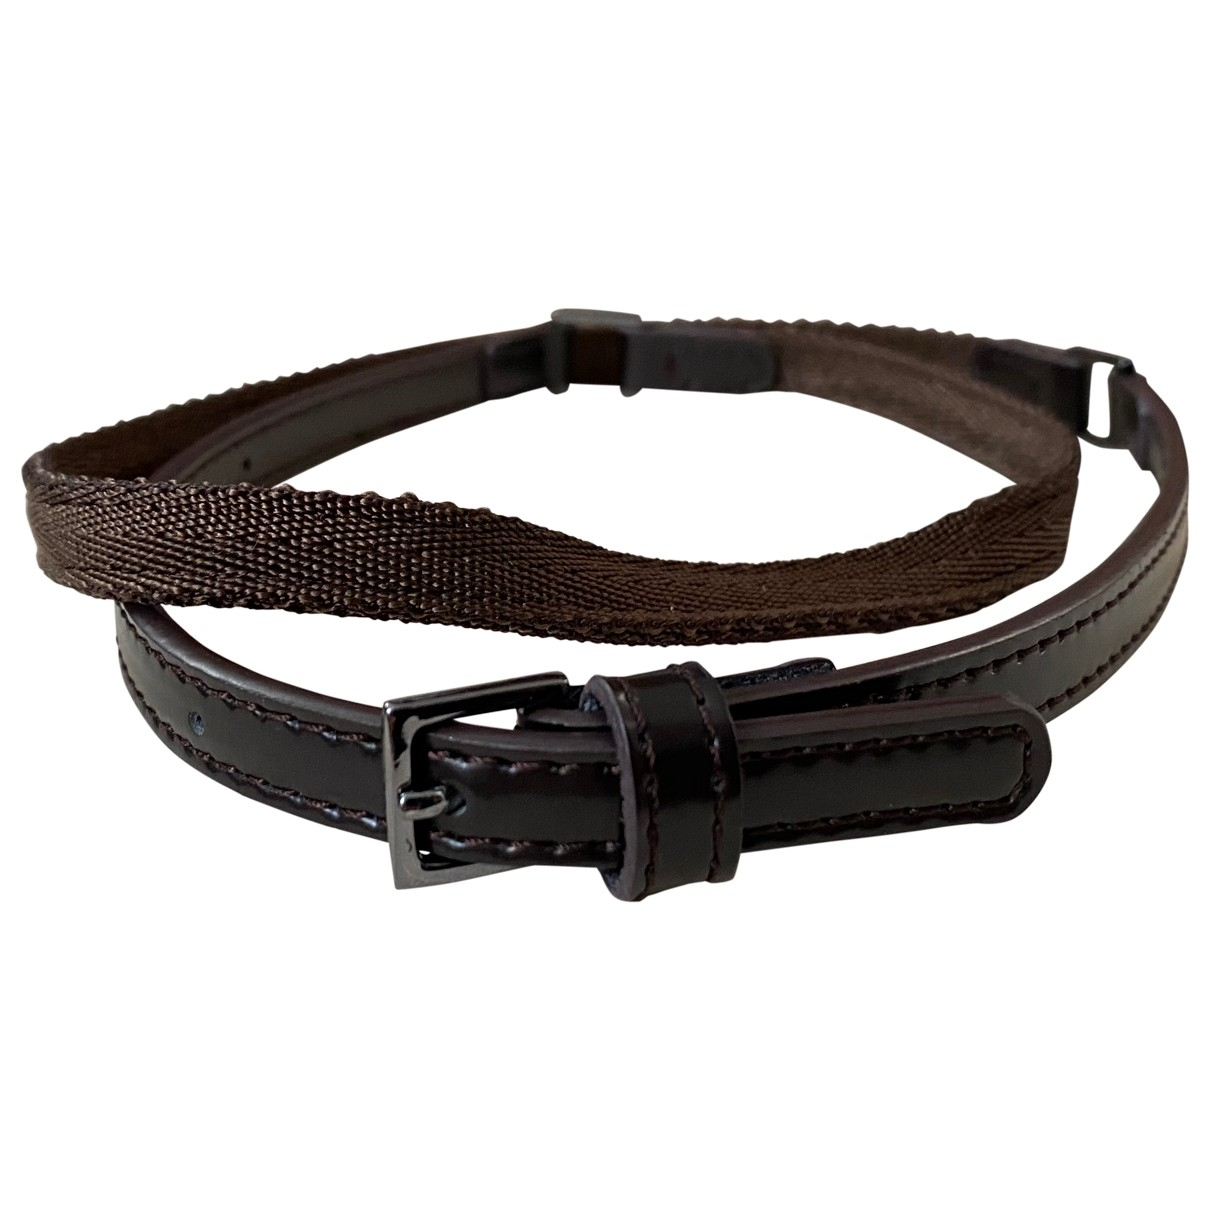 Max Mara 's \N Brown Leather belt for Women S International